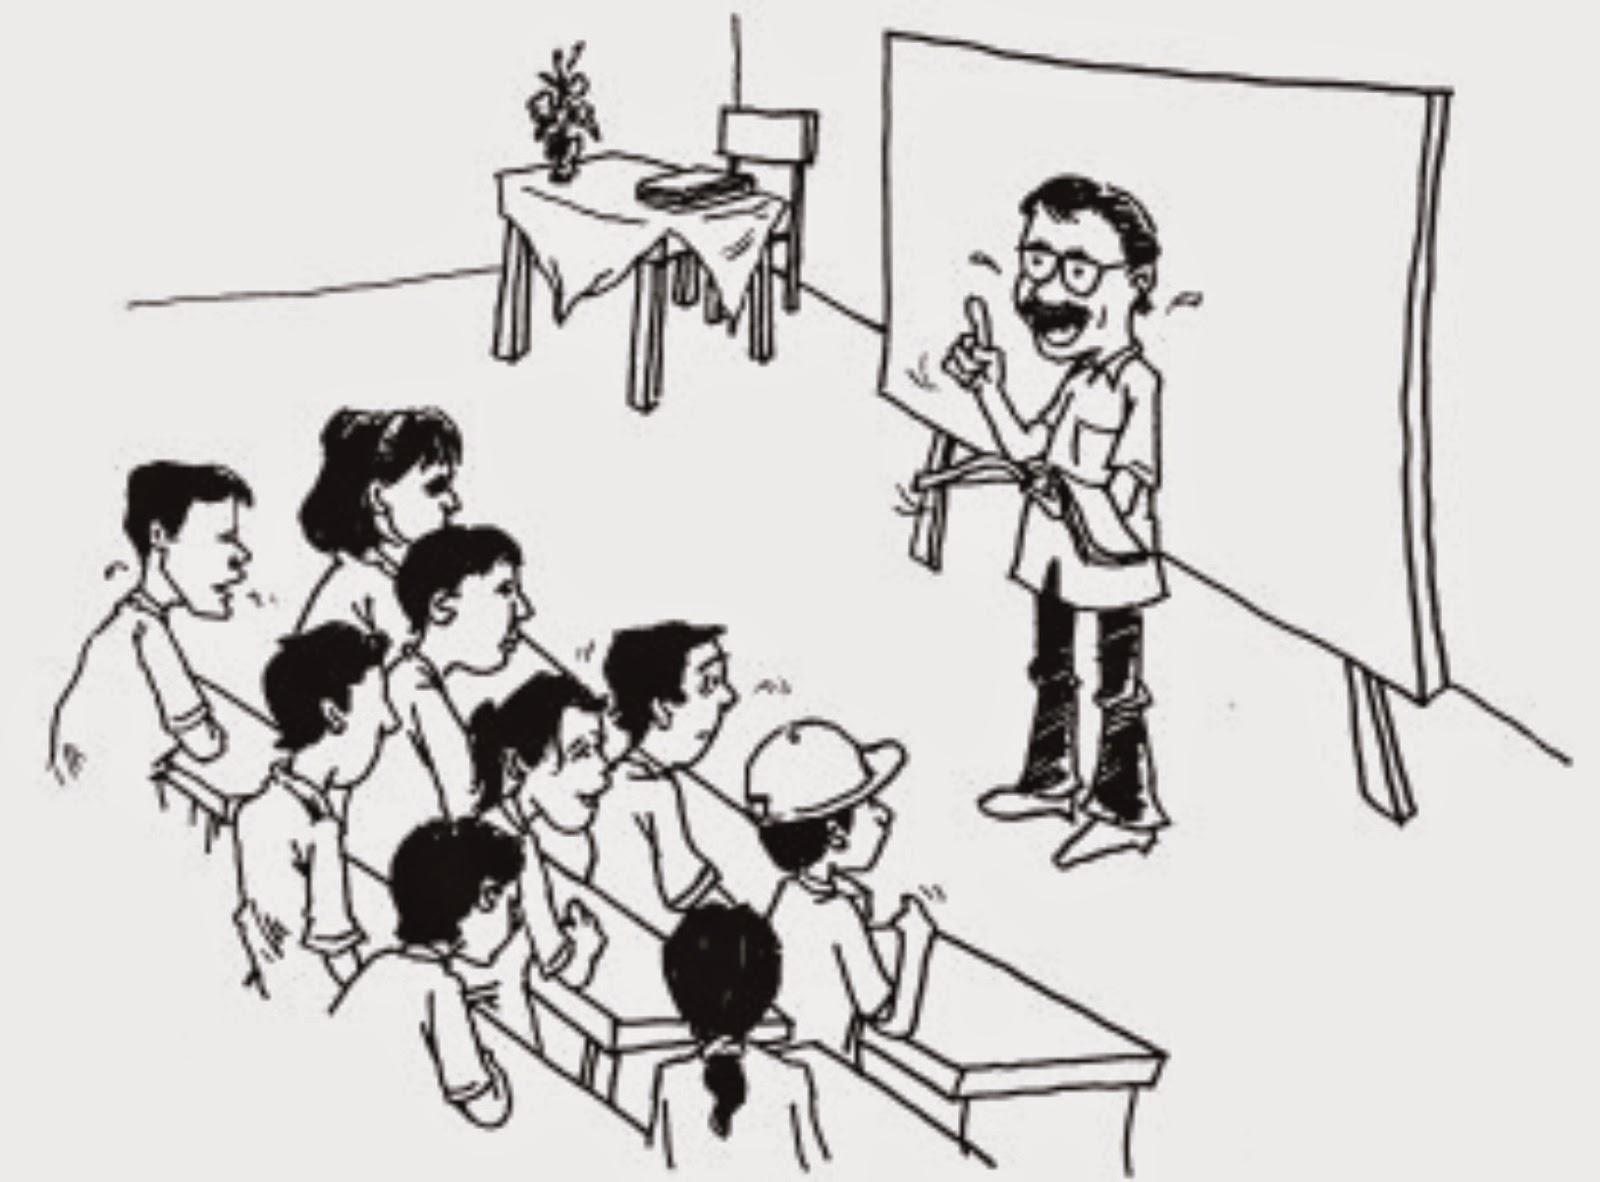 Kumpulan Animasi Bergerak Guru Muslimah Design Kartun